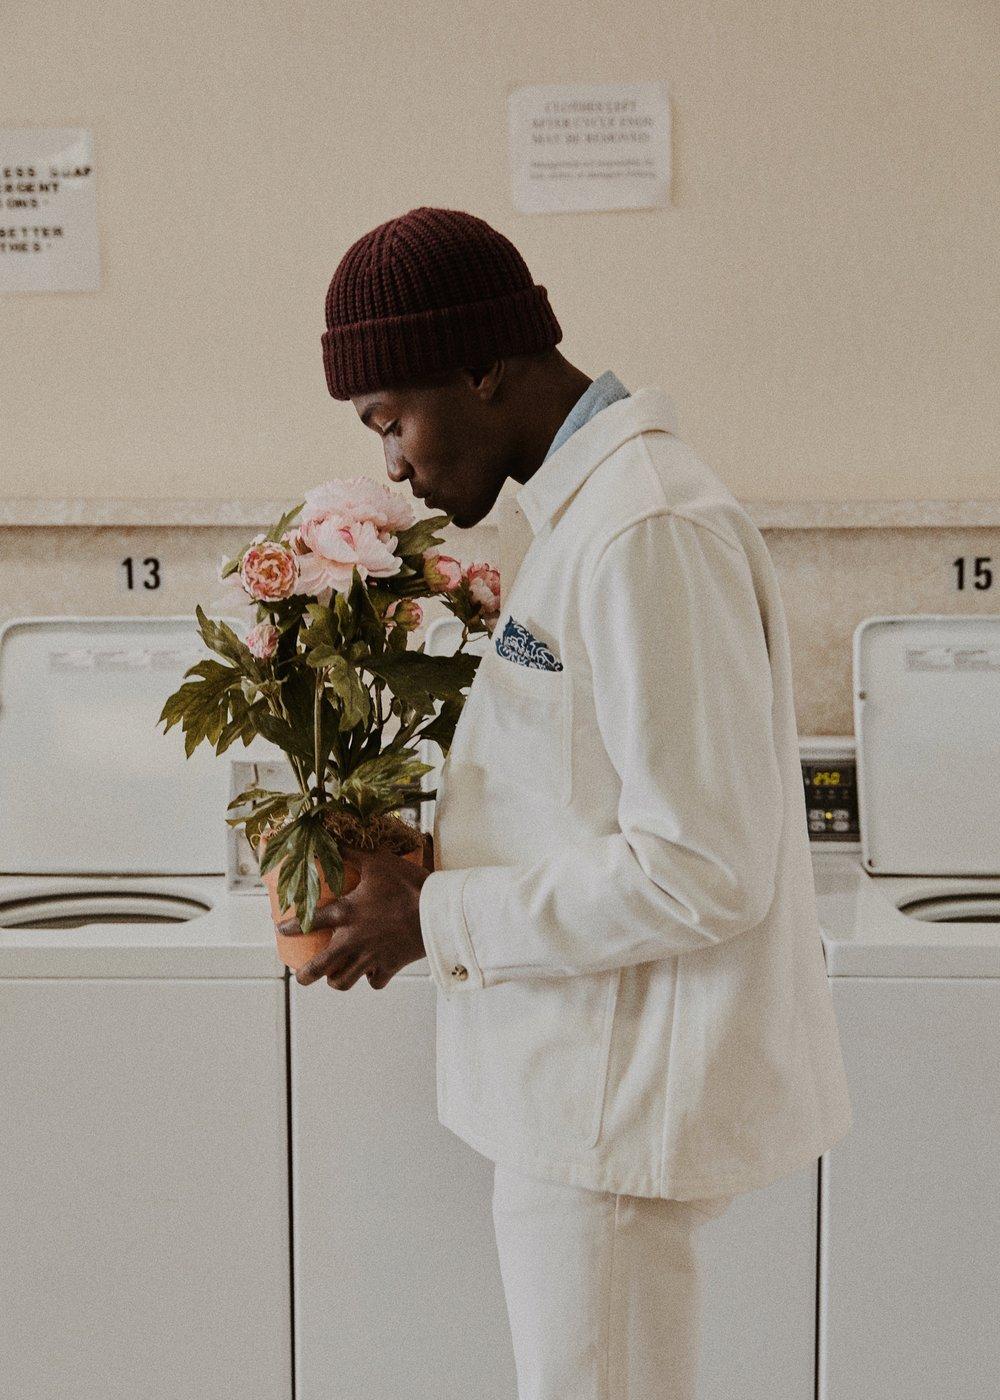 10_01_Laundromat-Arturo-Suzy-004_w.JPEG